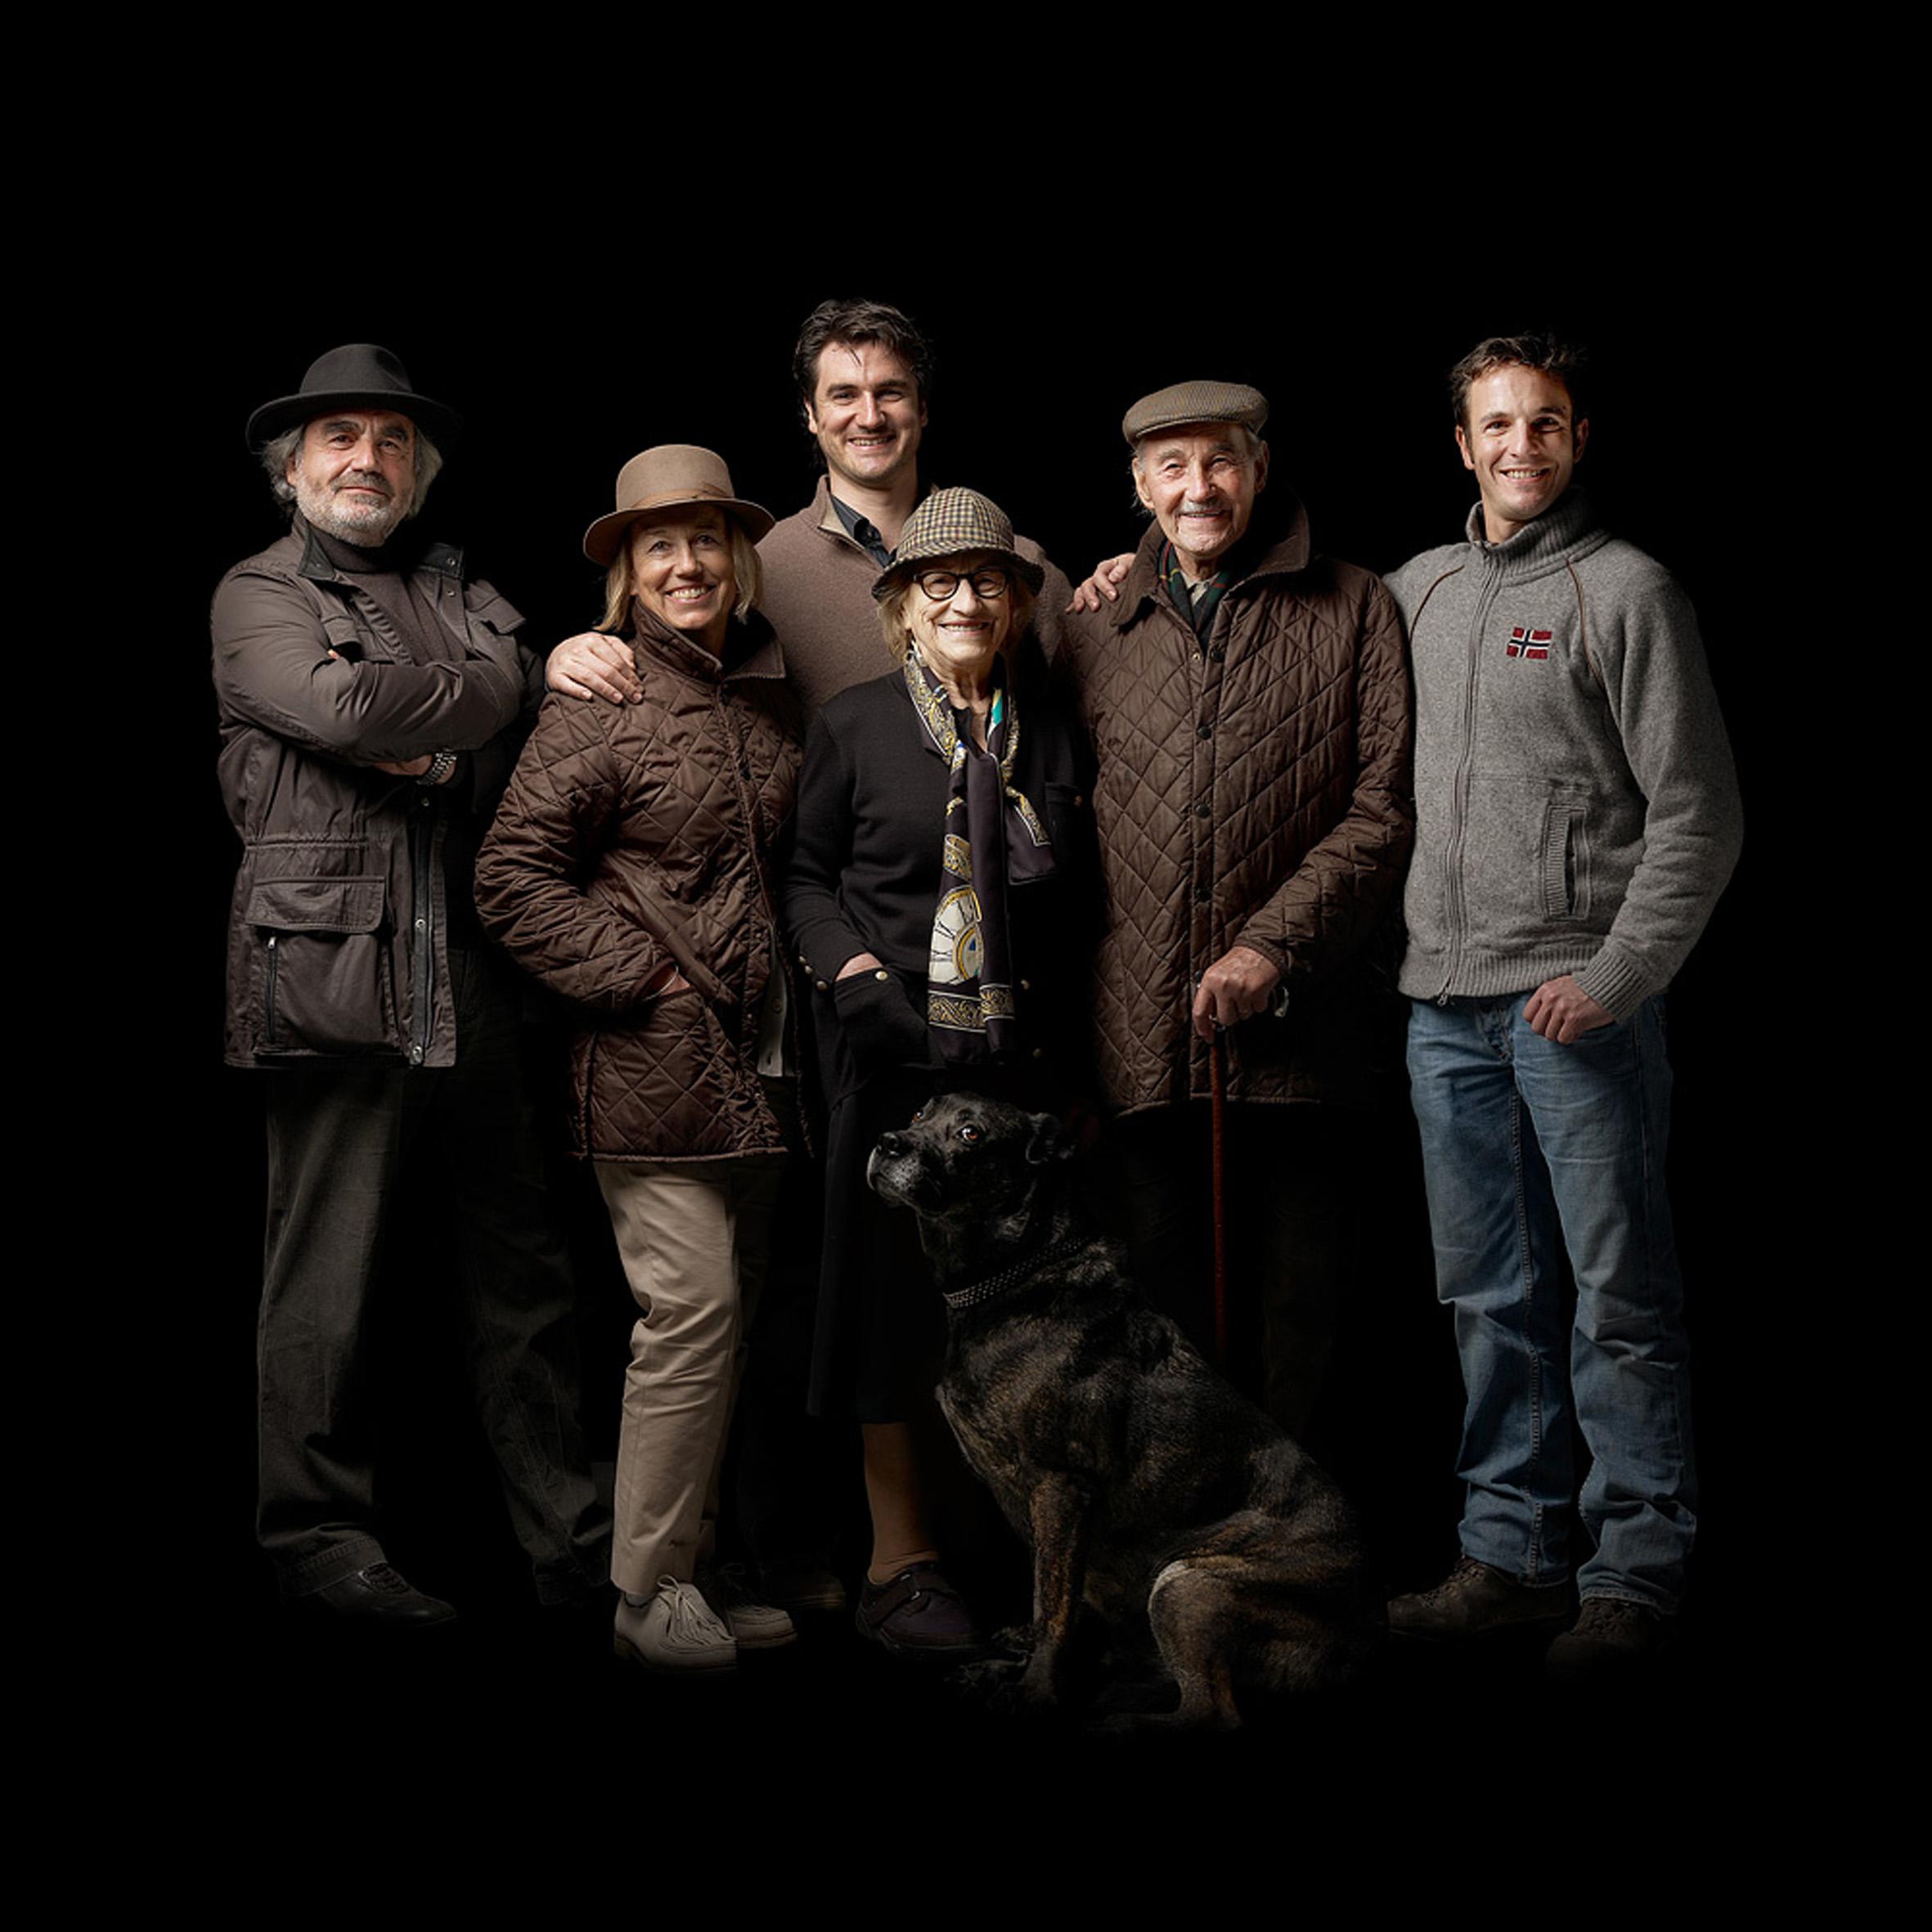 Famille GRASSA - Tariquet - Gascogne